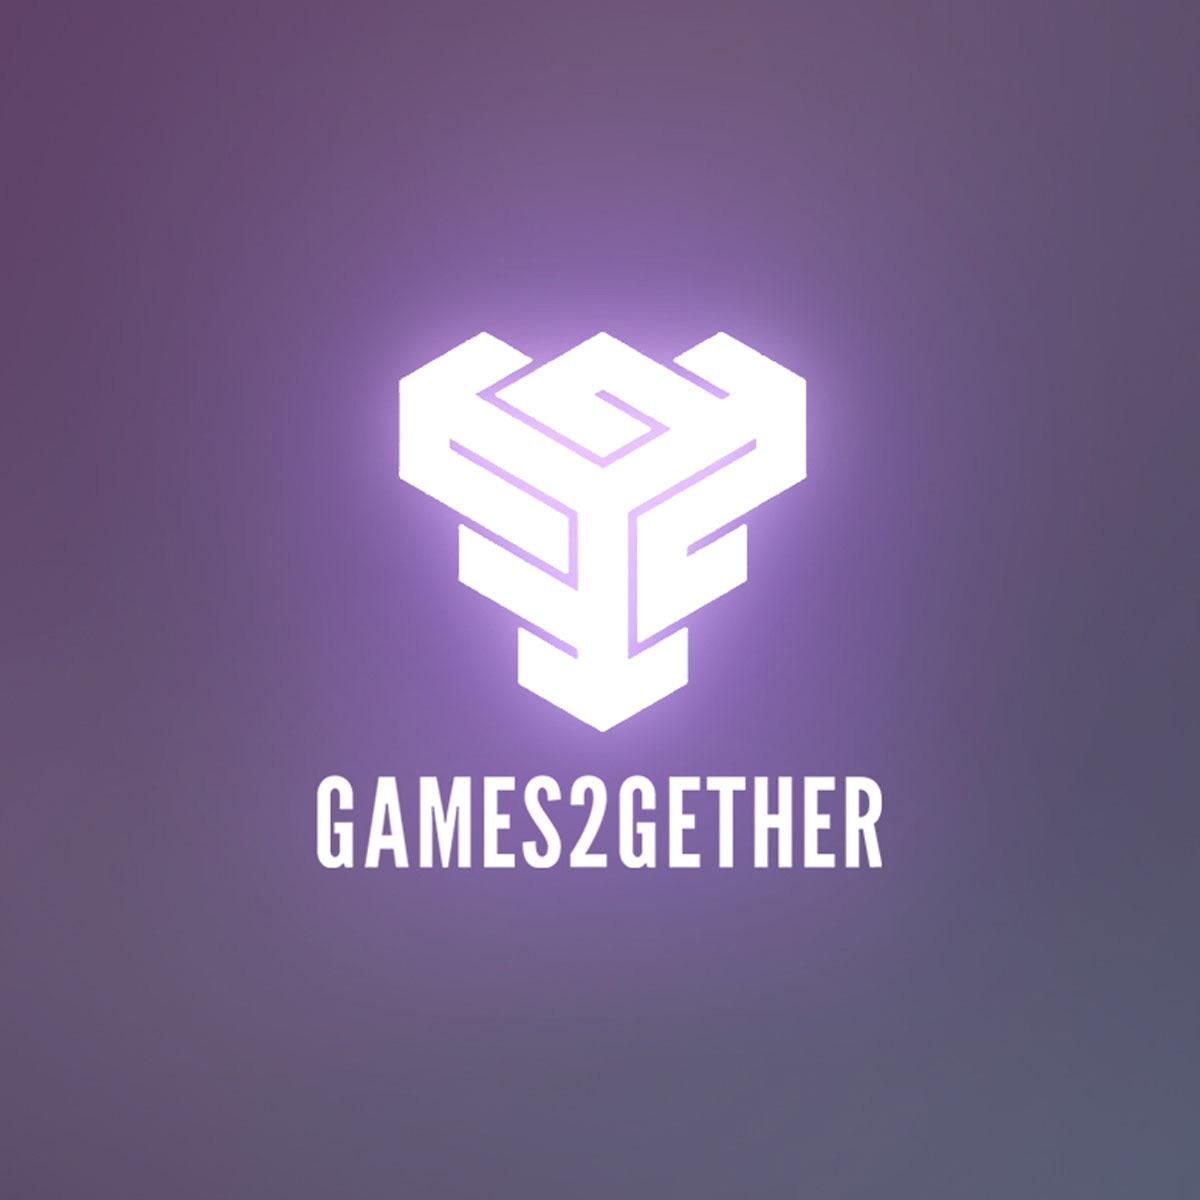 www.games2gether.com